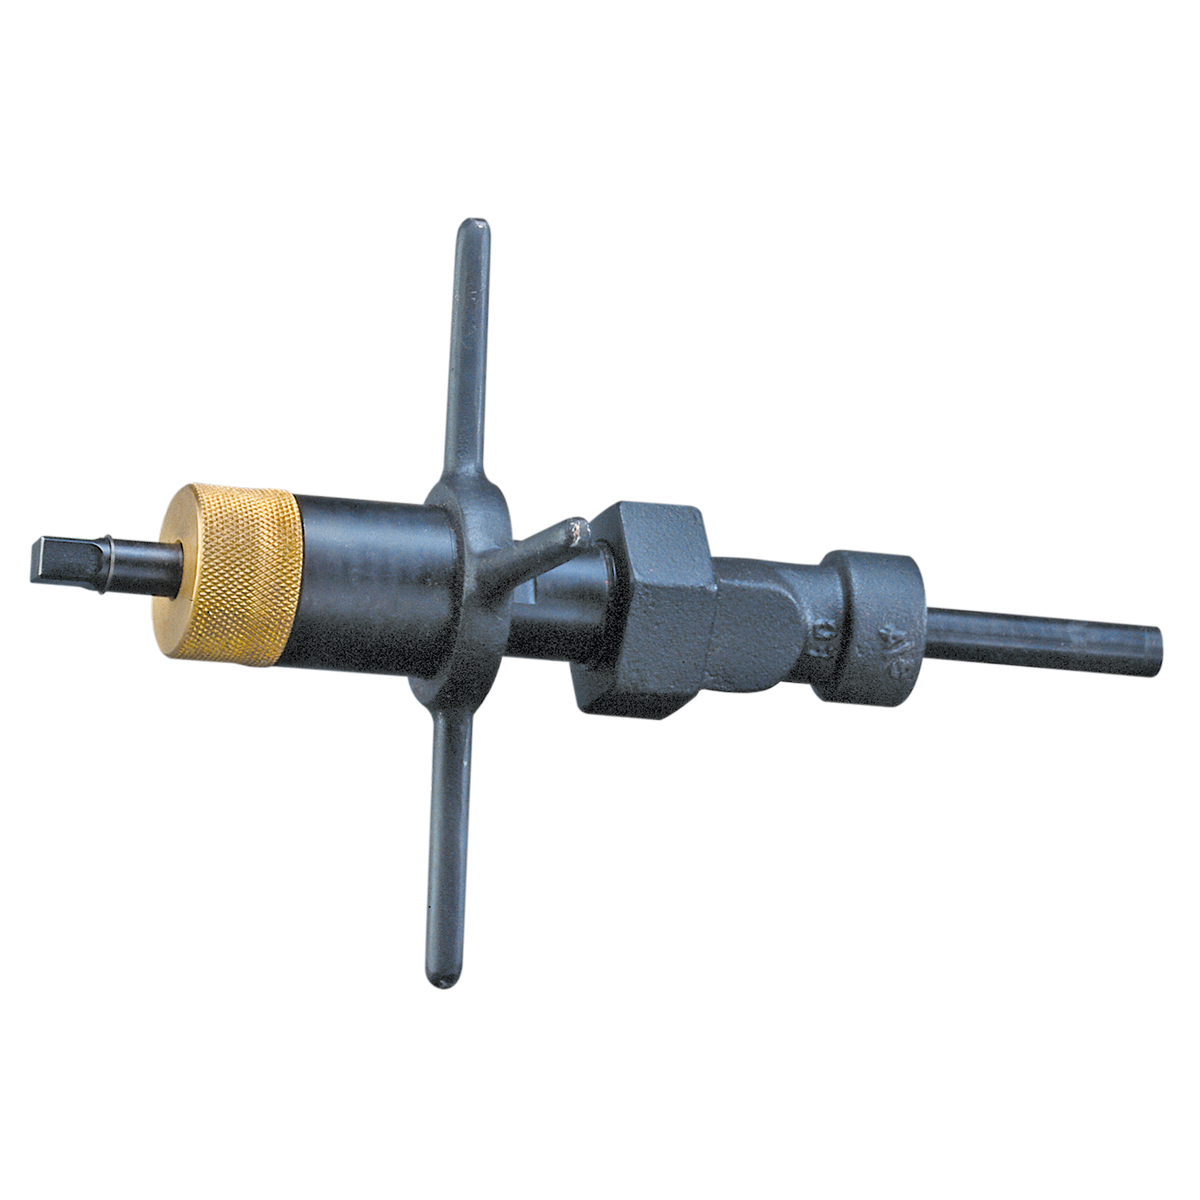 M-1 - Pipe drilling machine